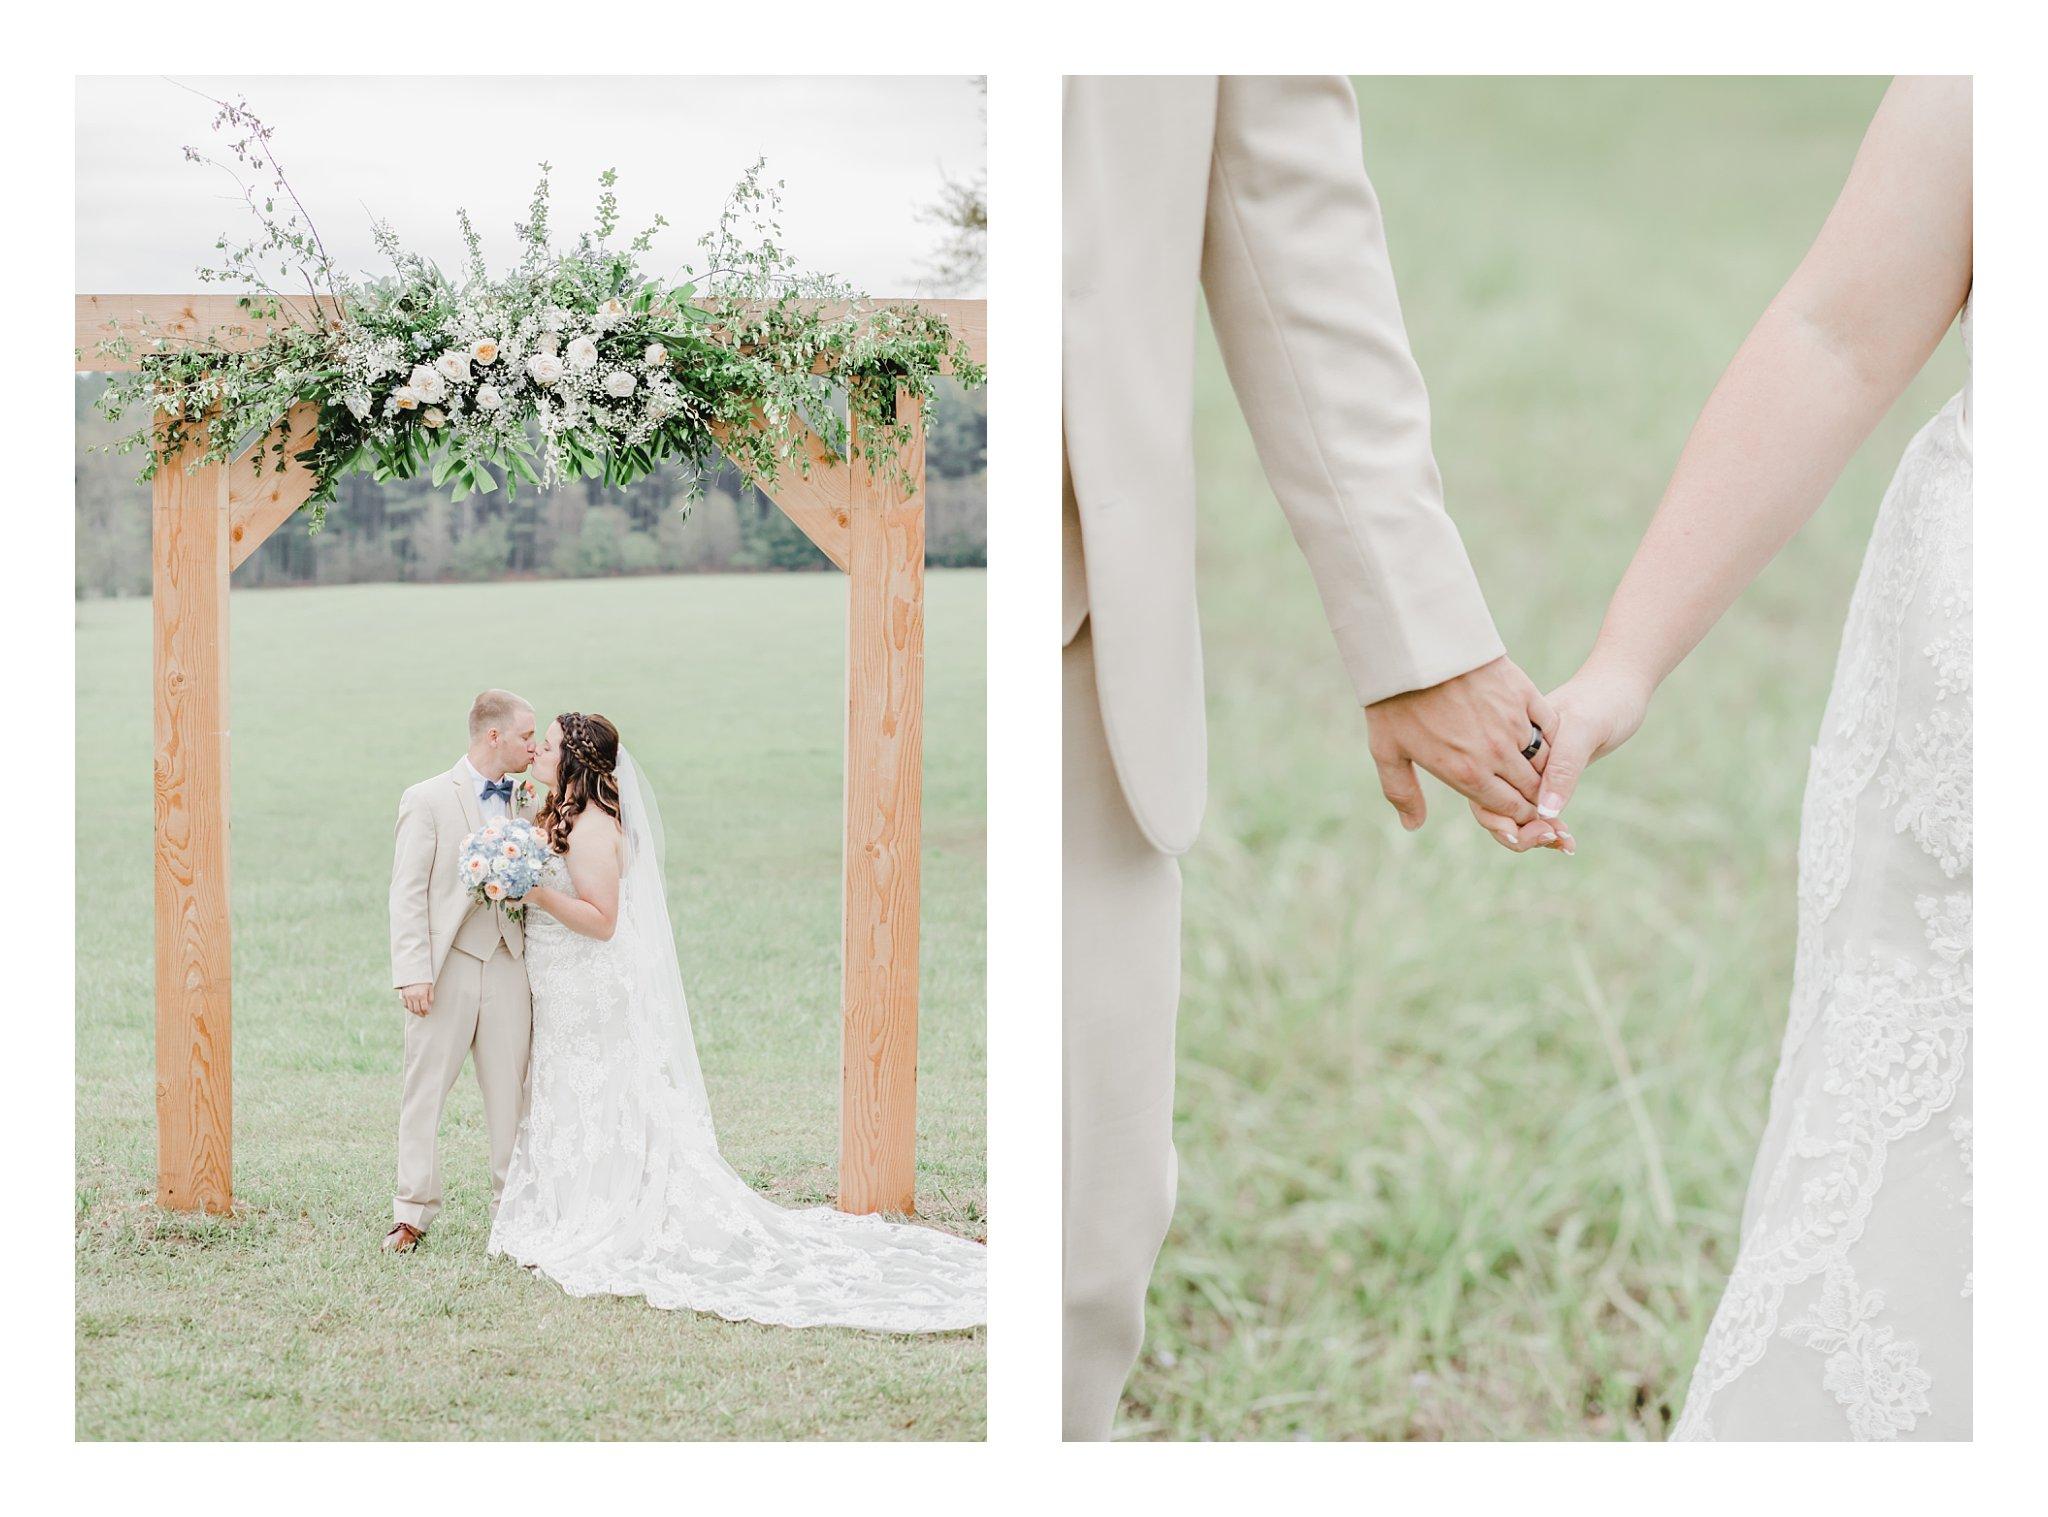 steel-blue-blush-spring-lace-gown-newberry-sc-wedding-photos-_0029.jpg